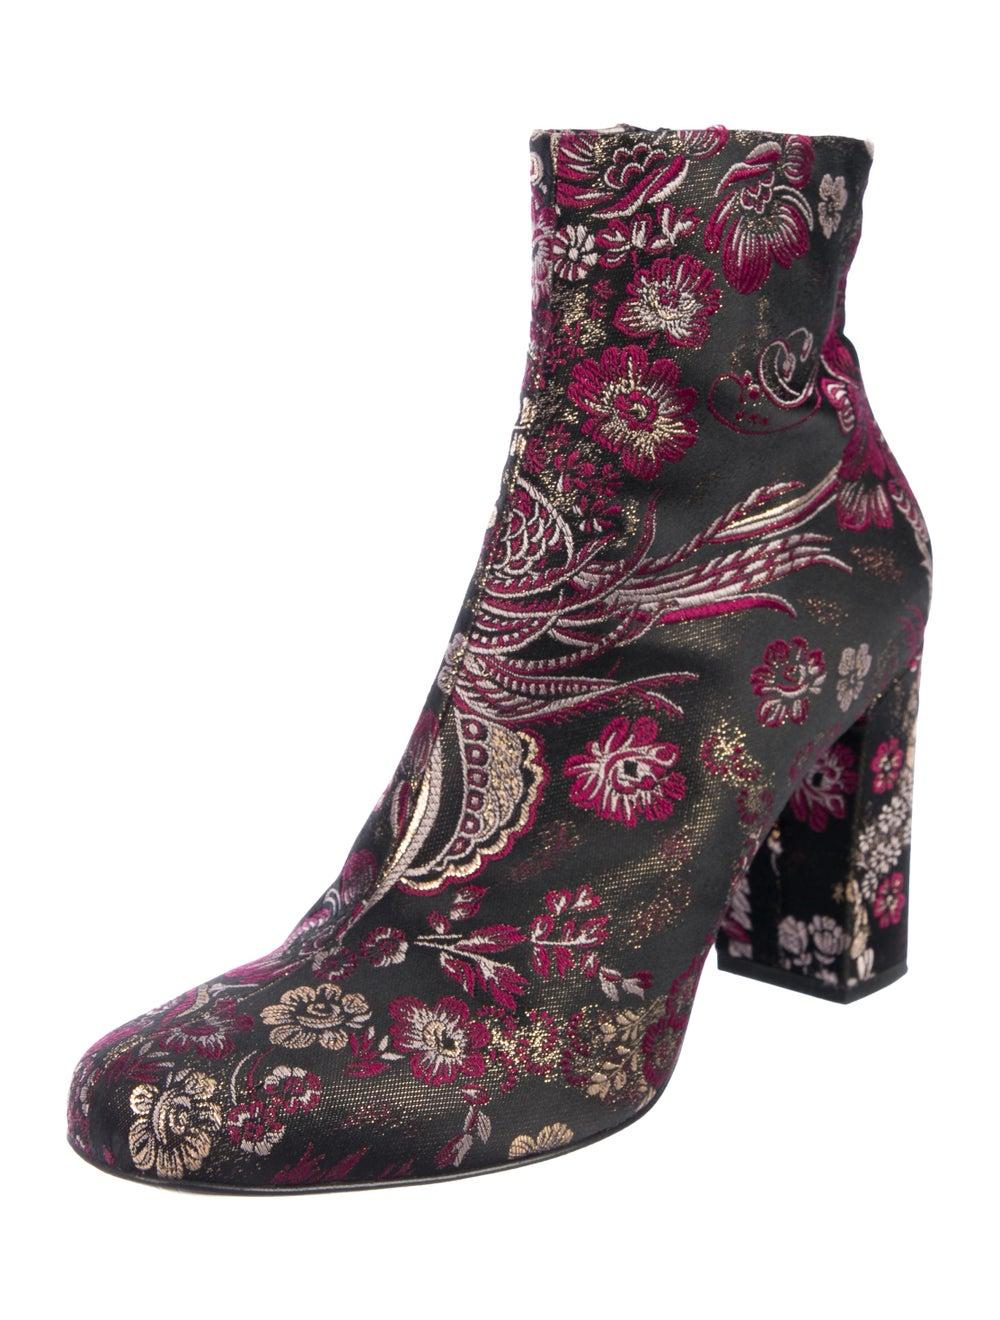 Saint Laurent Brocade Ankle Boots Pink - image 2